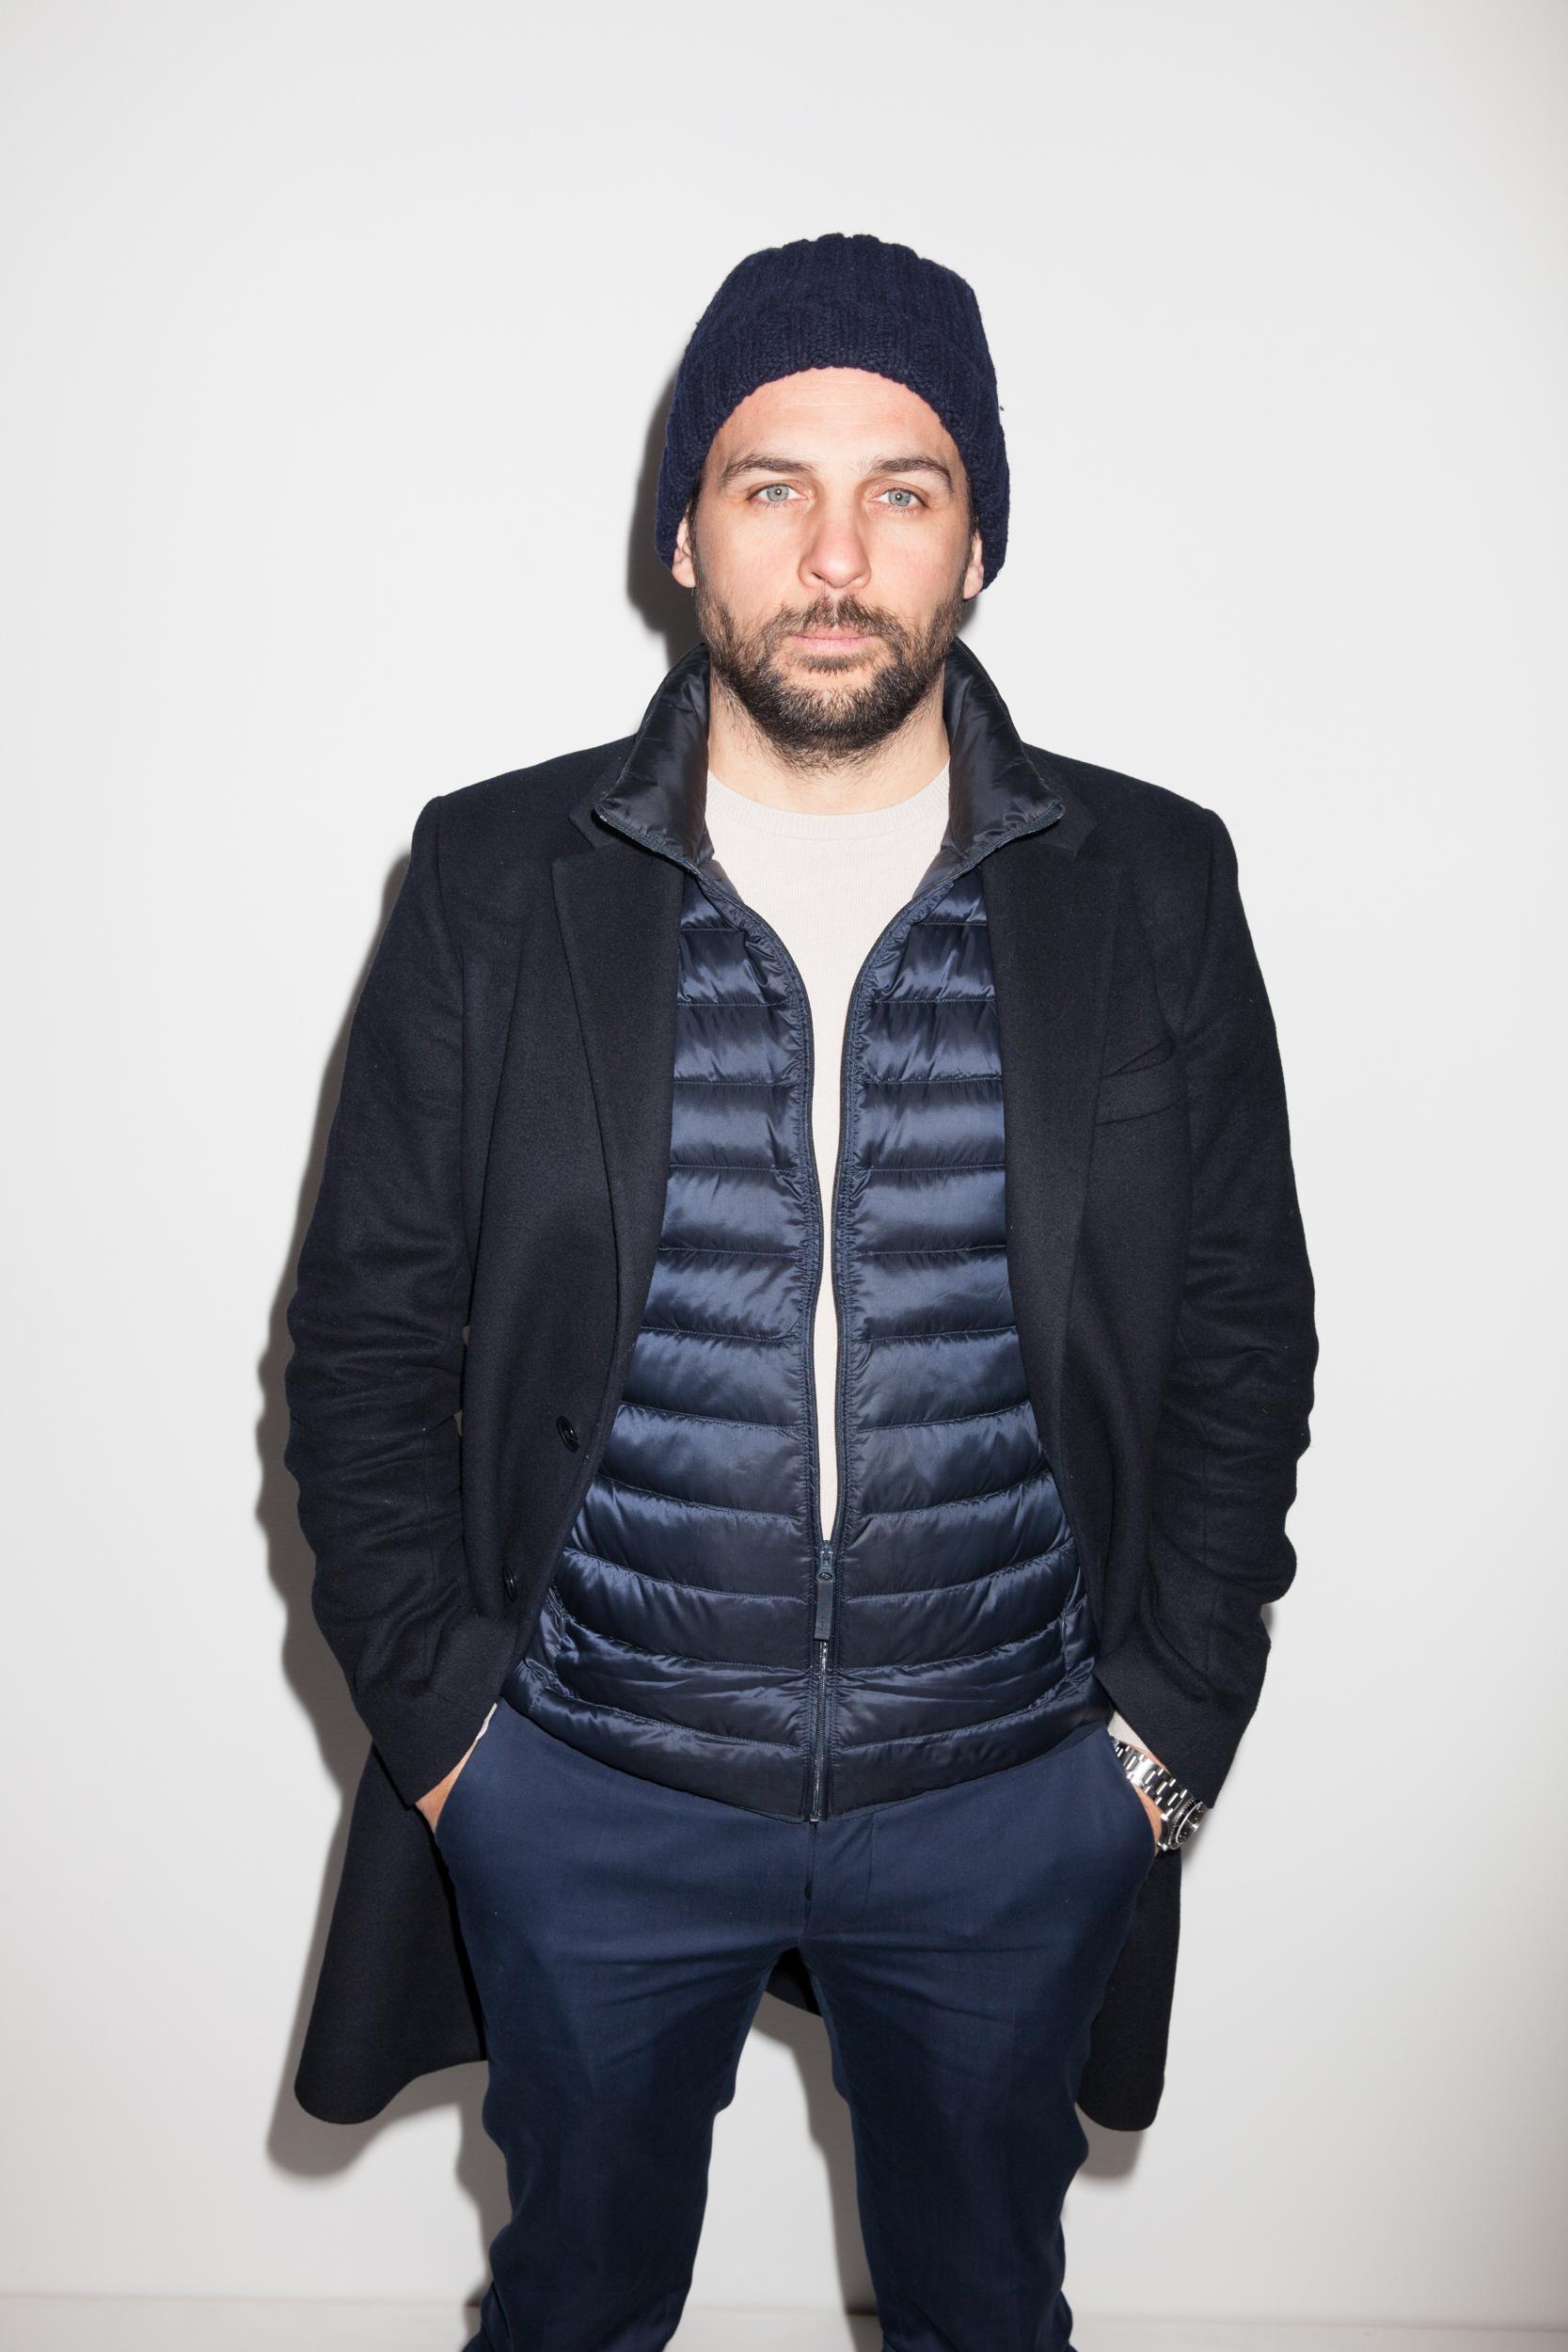 Posh - interview - studio - april